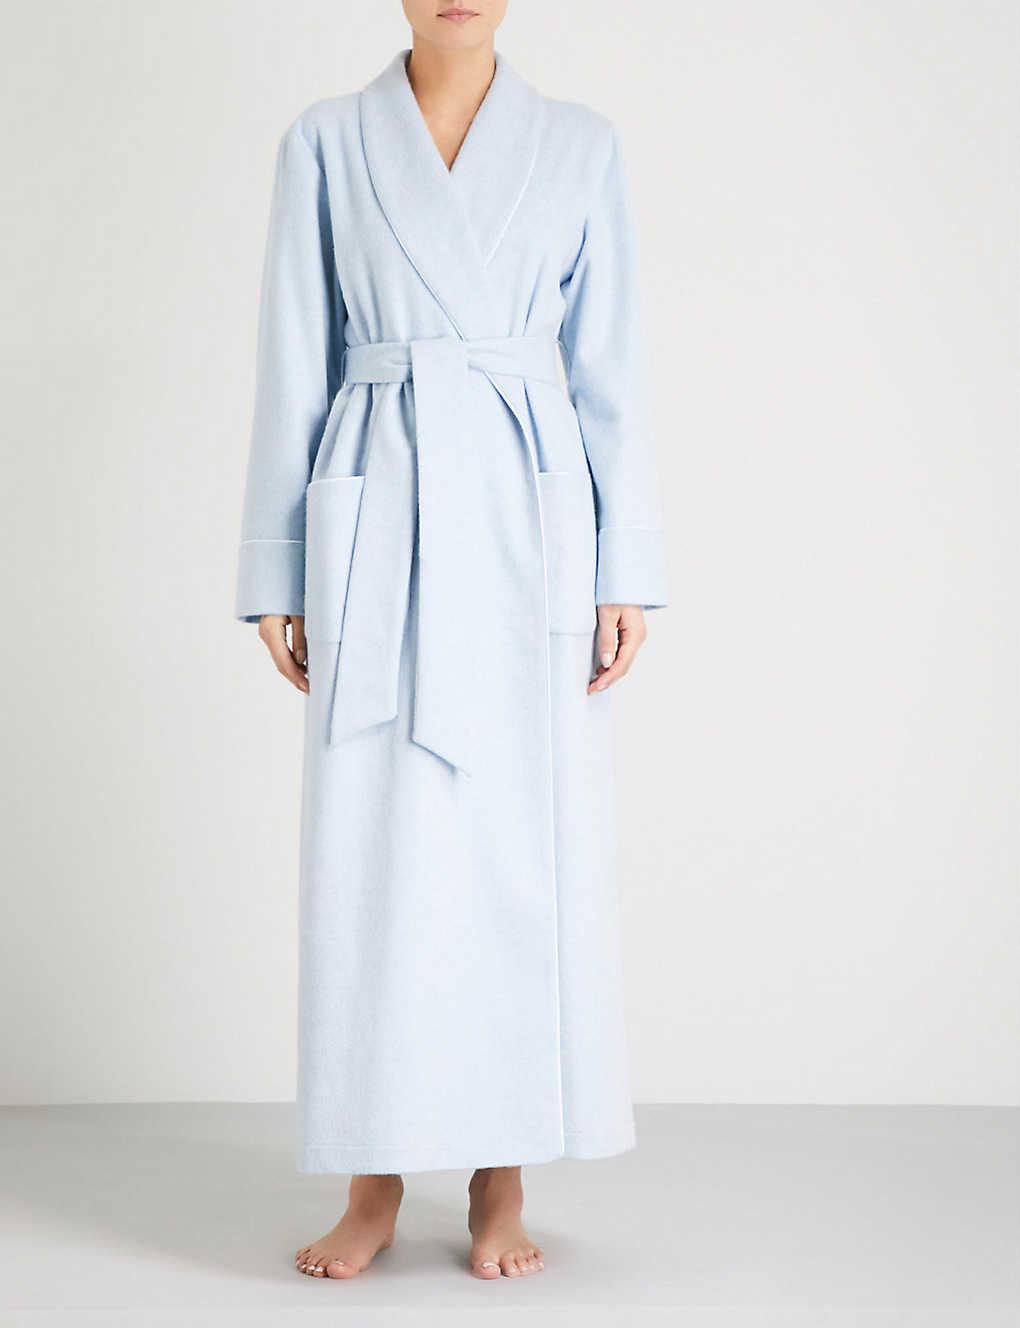 JOHNSTONS - Ladies cashmere dressing gown   Selfridges.com